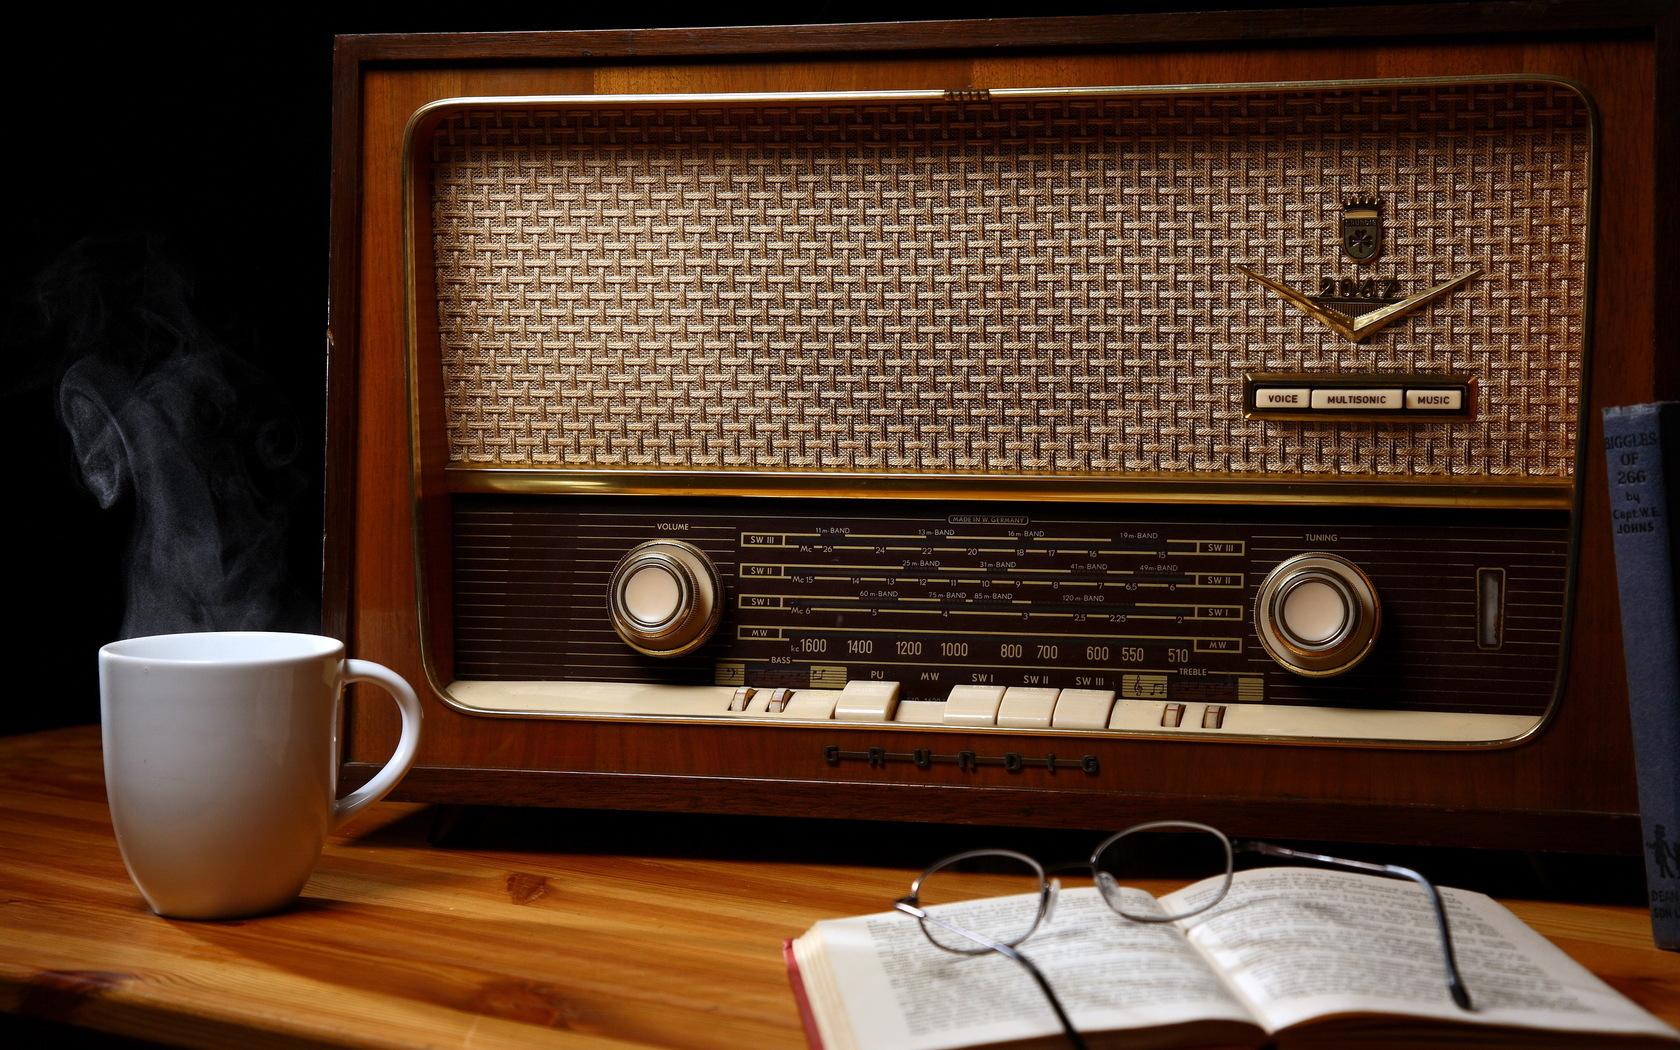 27009 скачать обои Фон, Радио, Чашки, Натюрморт - заставки и картинки бесплатно